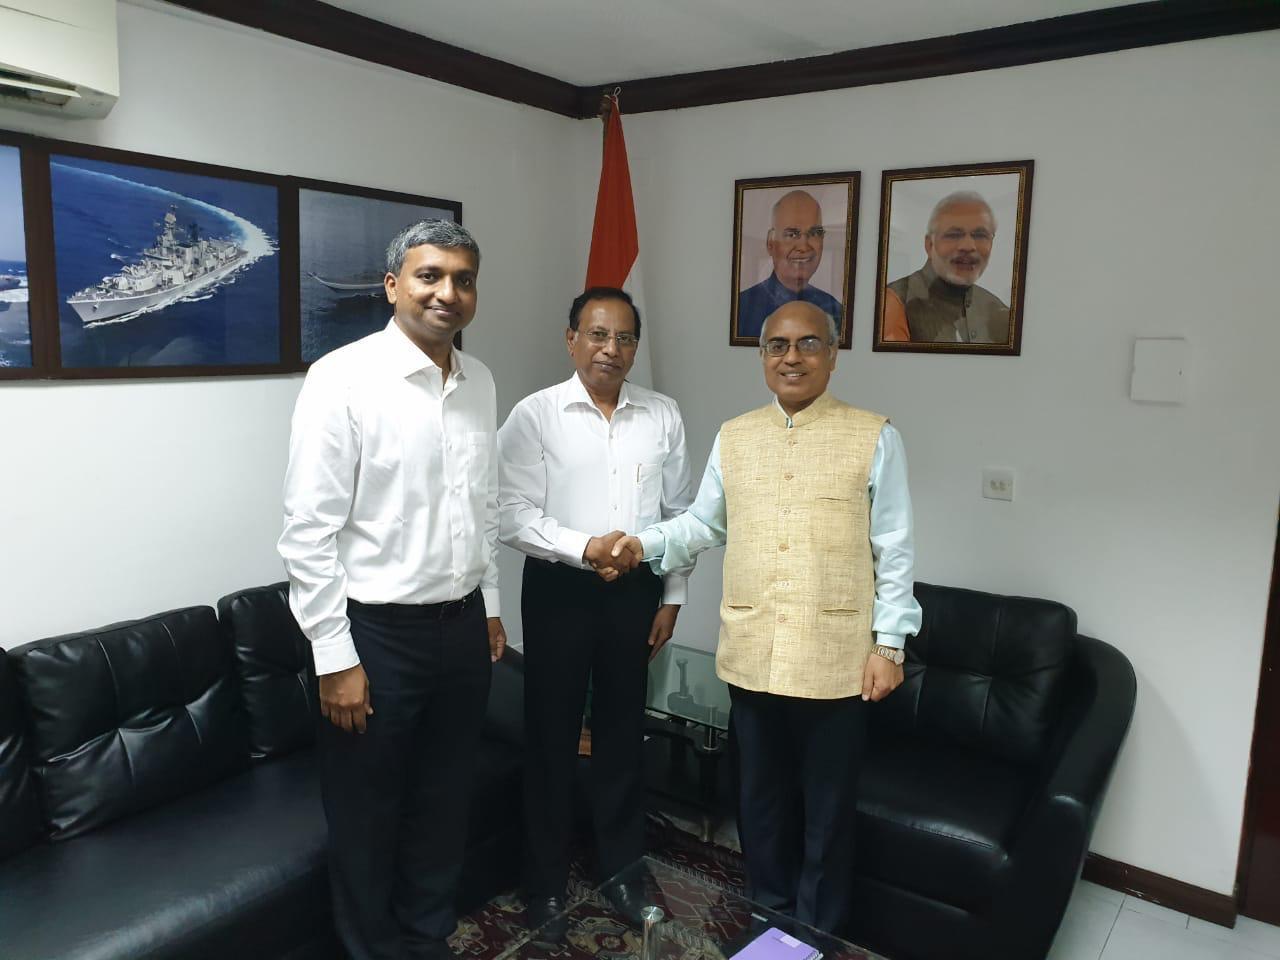 Mr Ramachandra and Dr Prasanna Venkatesh - NU Hospitals - Bengaluru - with His Excellency Mr Akhilesh Mishra, Ambassador to Maldives 🇲🇻 Embassy of India 🇮🇳 at Male , Maldives.